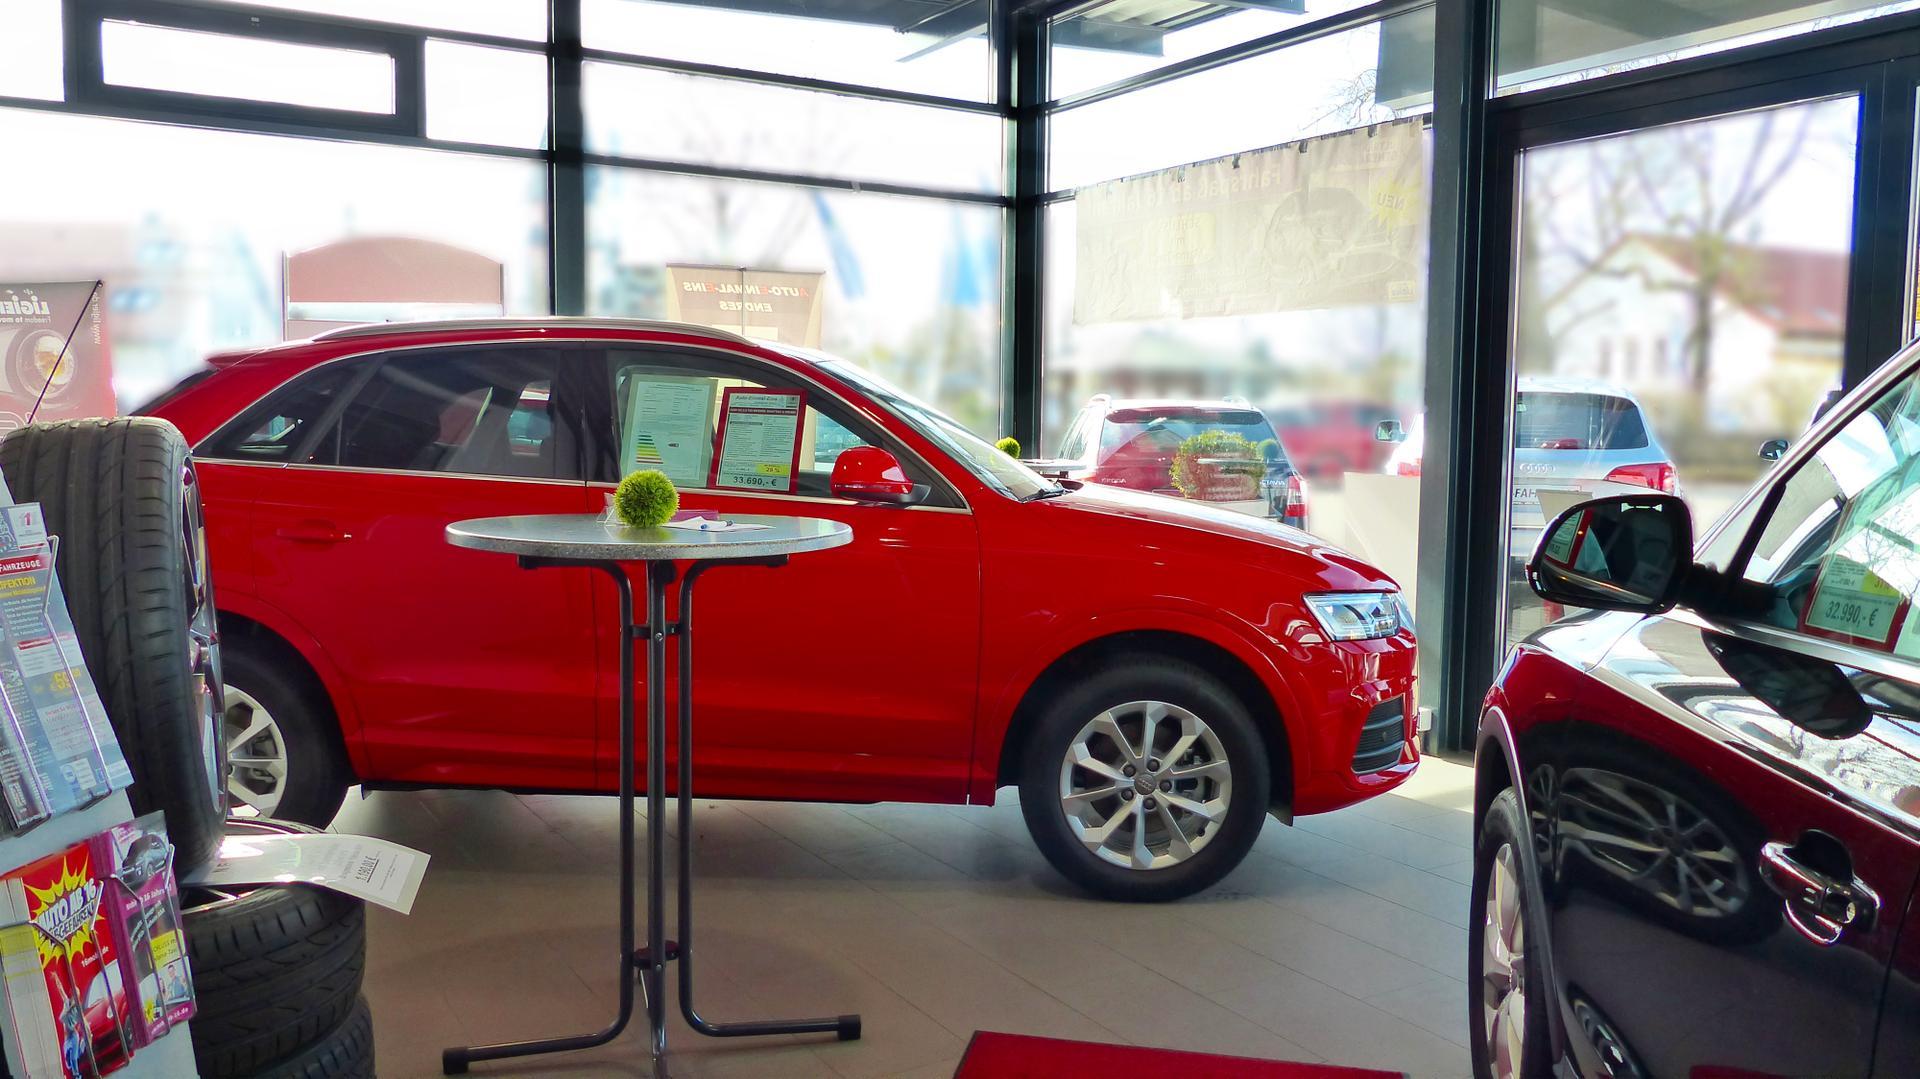 EU-Fahrzeuge Nürnberg Allersberg Auto-Einmal-Eins Audi Q3 rot